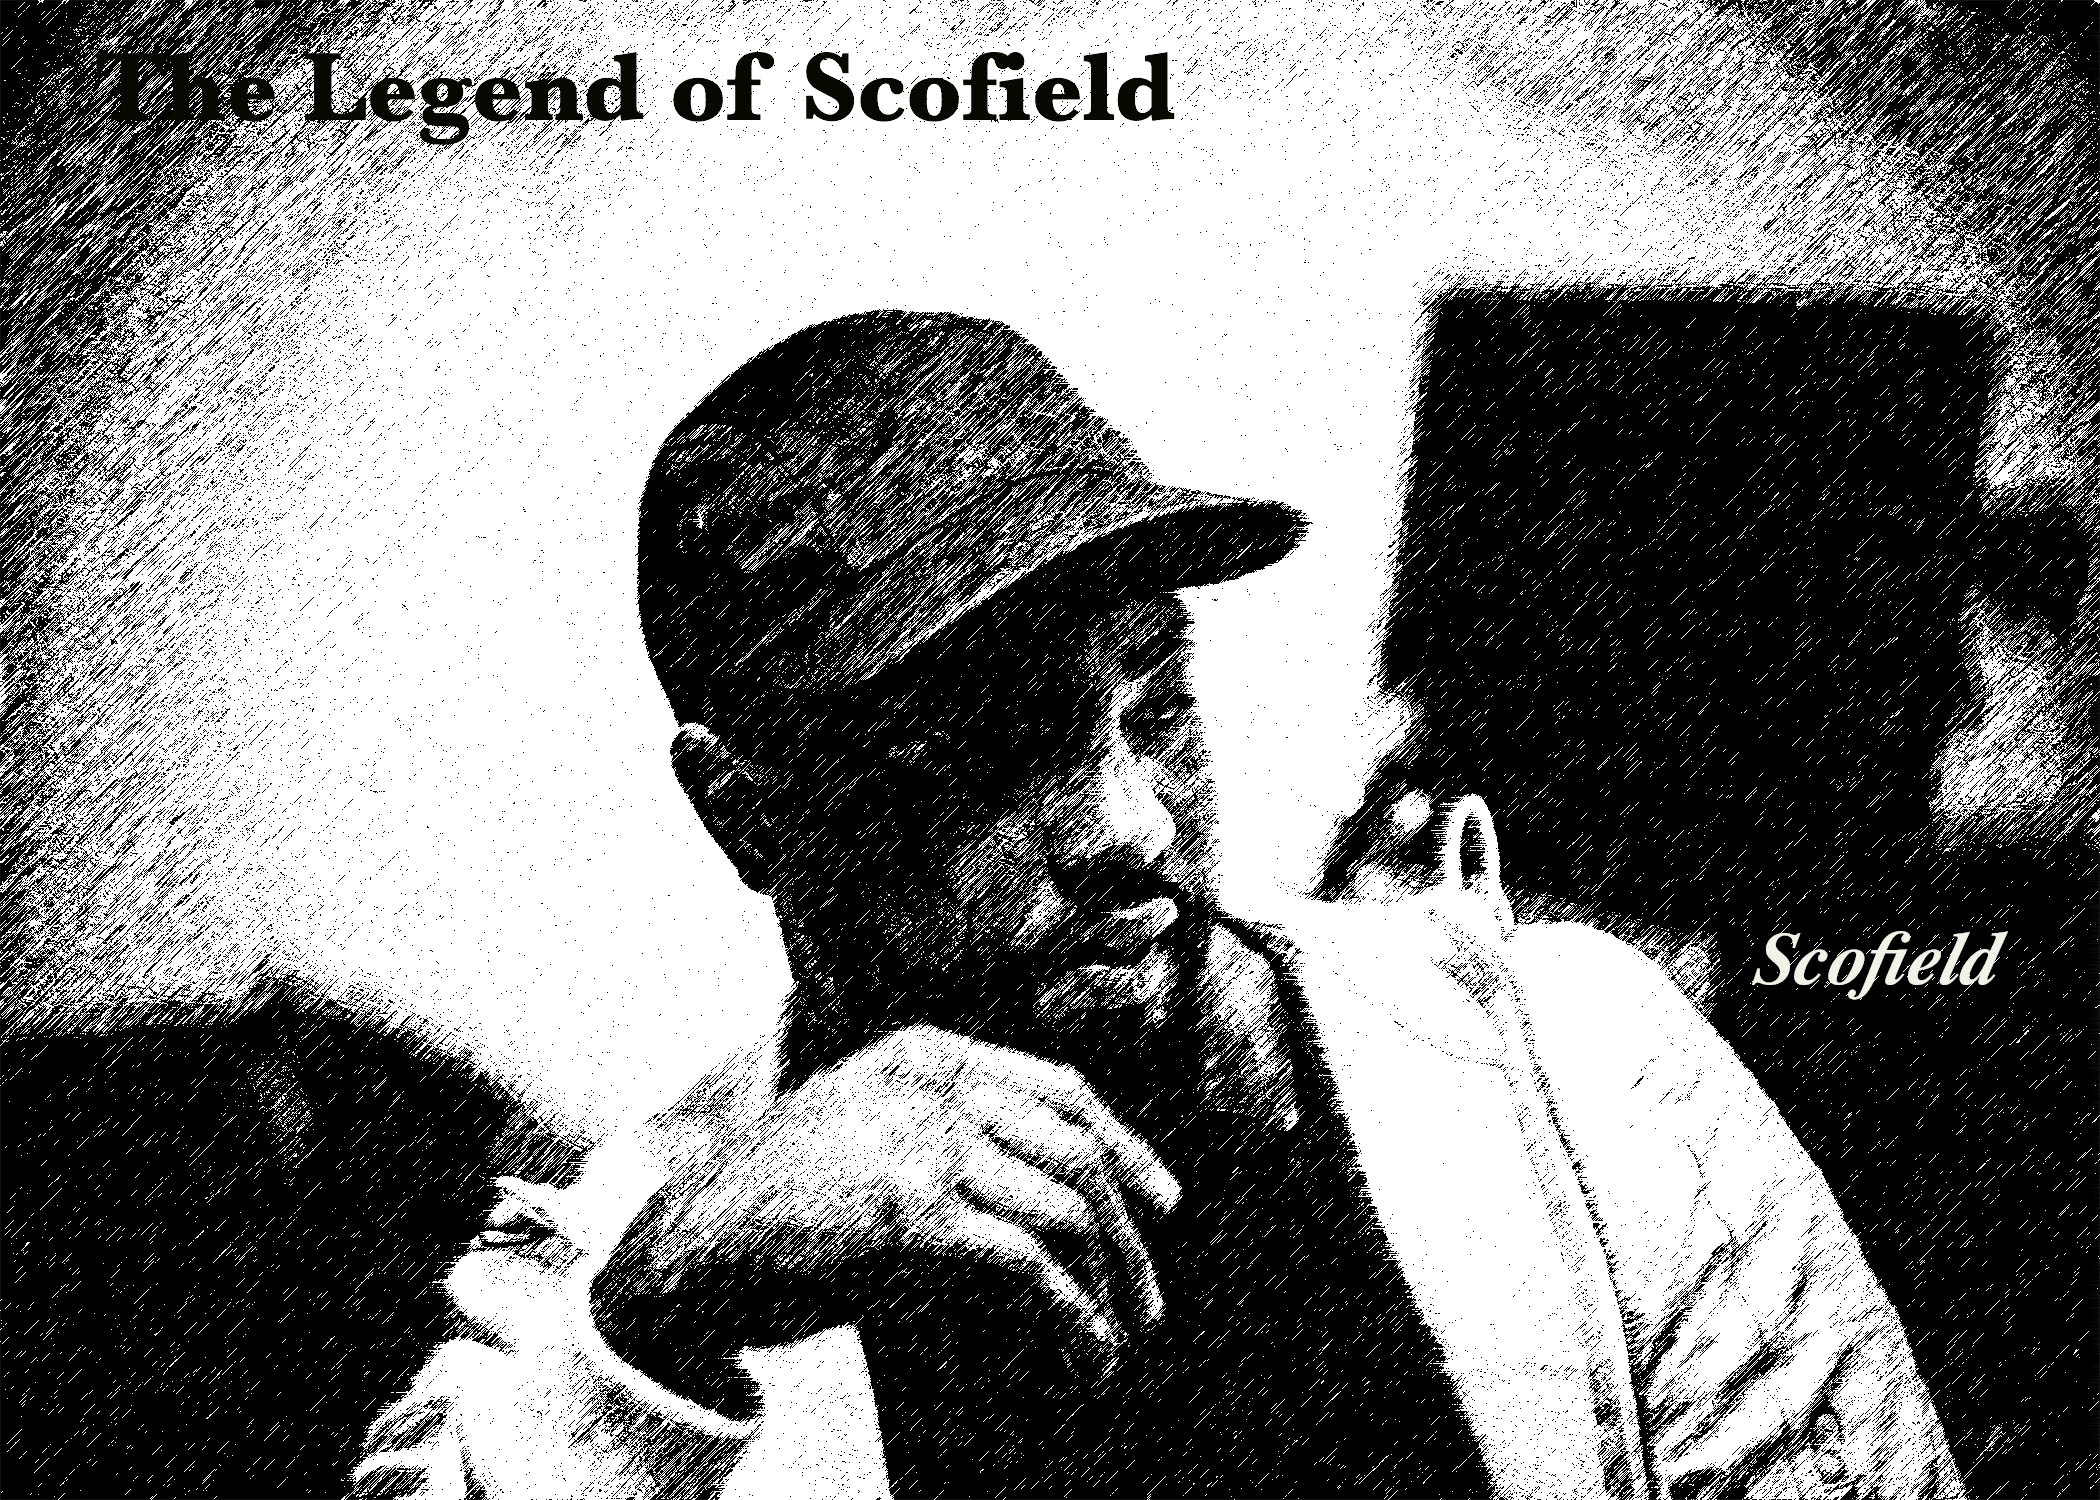 Scofield- The Legend of Scofield